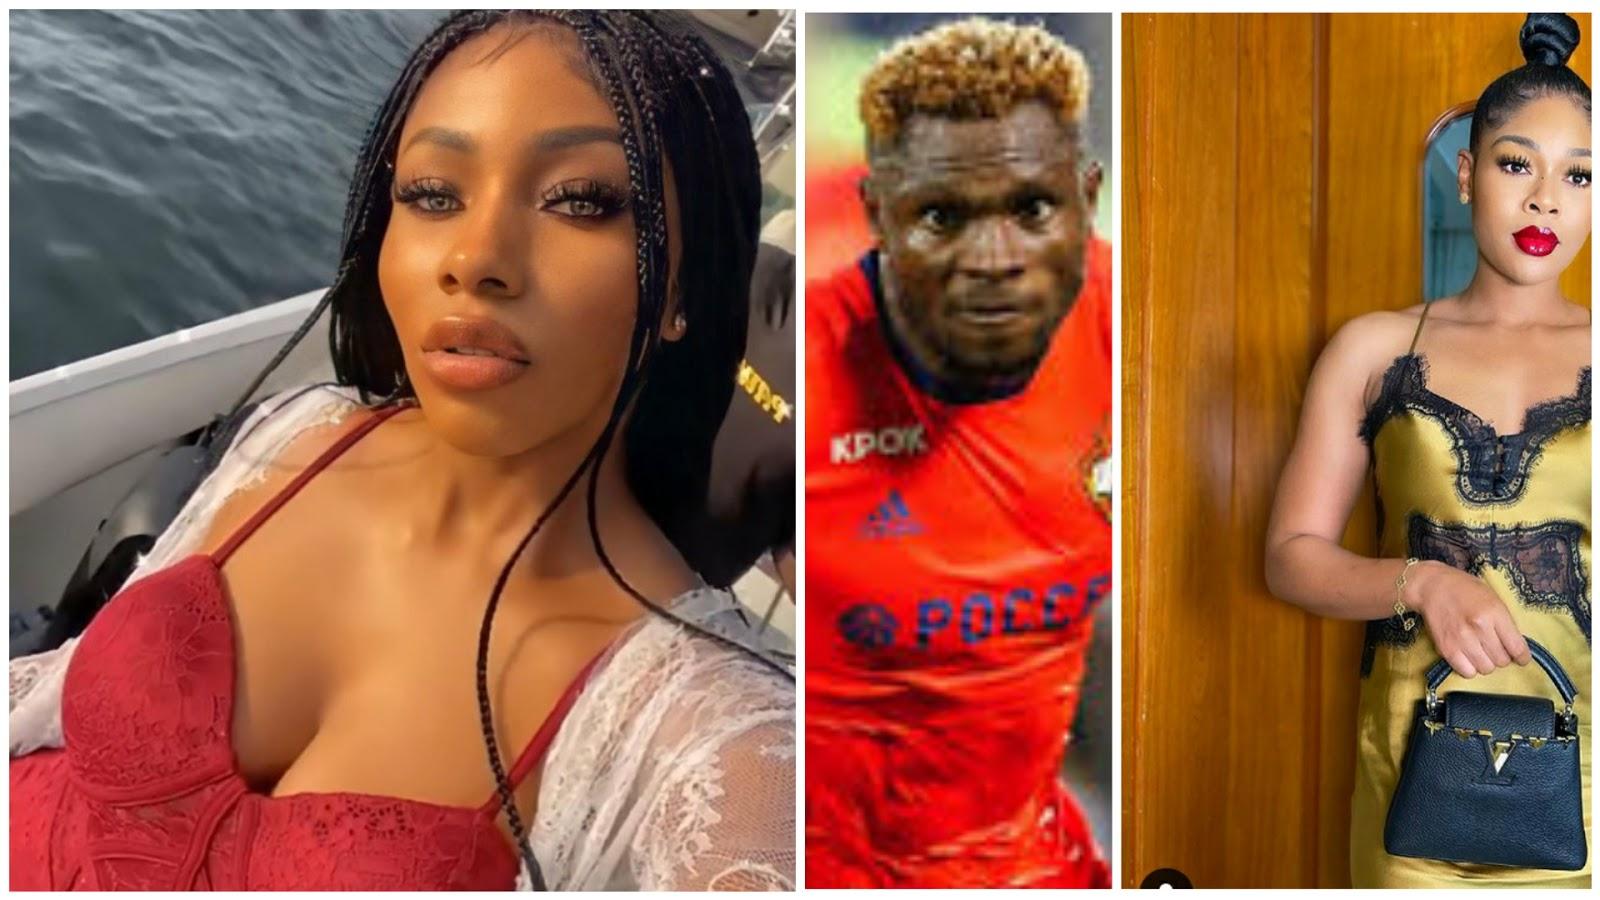 BREAKING: Nigerian footballer, Samuel Aaron cheats on wife with Mercy Eke